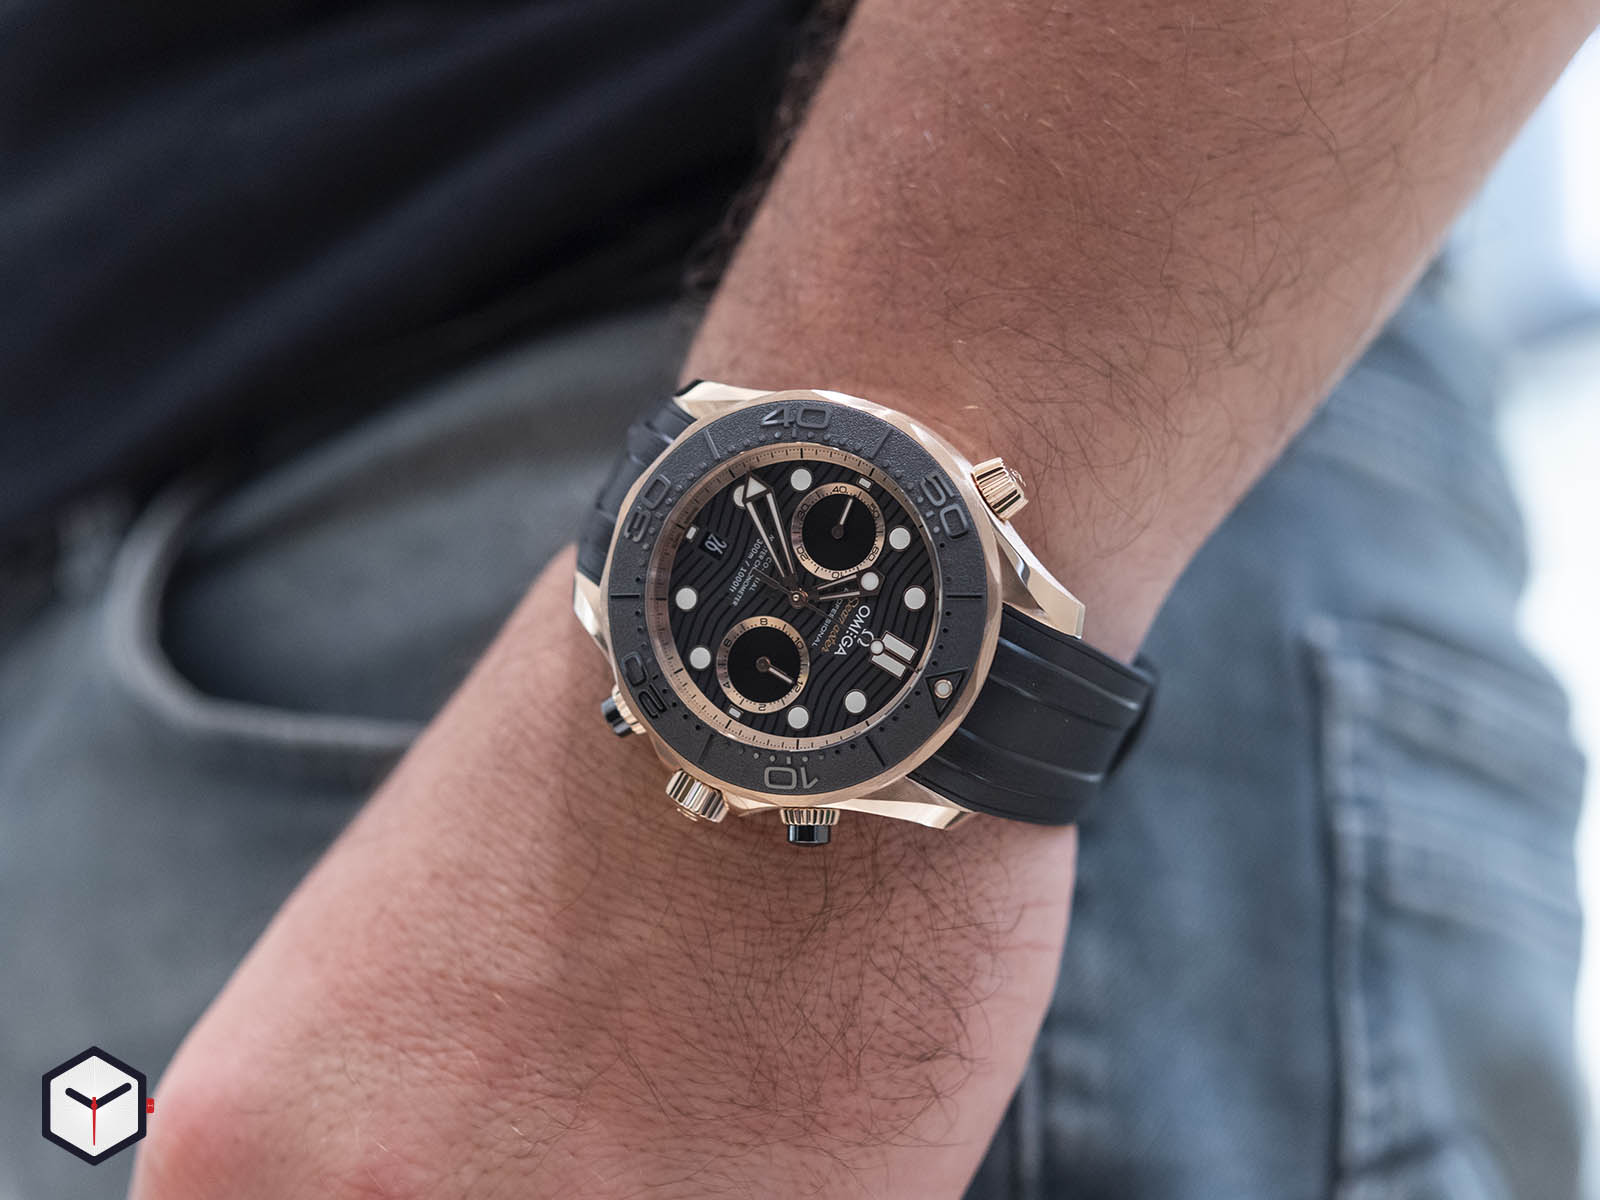 210-62-44-51-01-001-omega-seamaster-diver-300m-co-axial-master-chronometer-chronograph-8.jpg